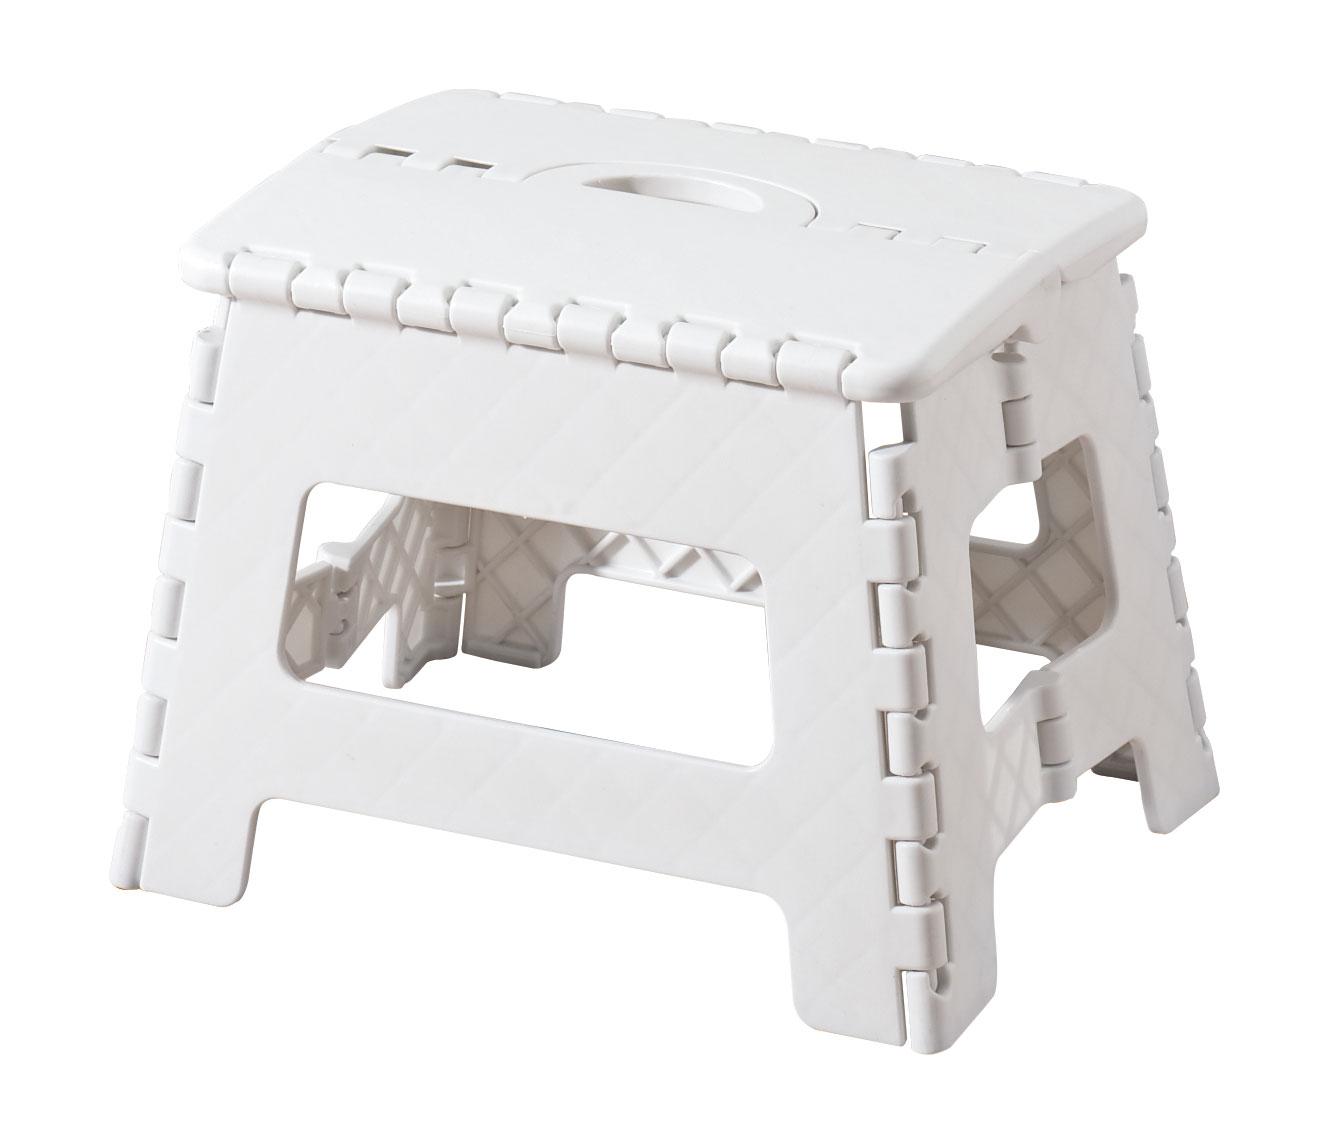 ebay itm tier white stool rubbermaid this step folding